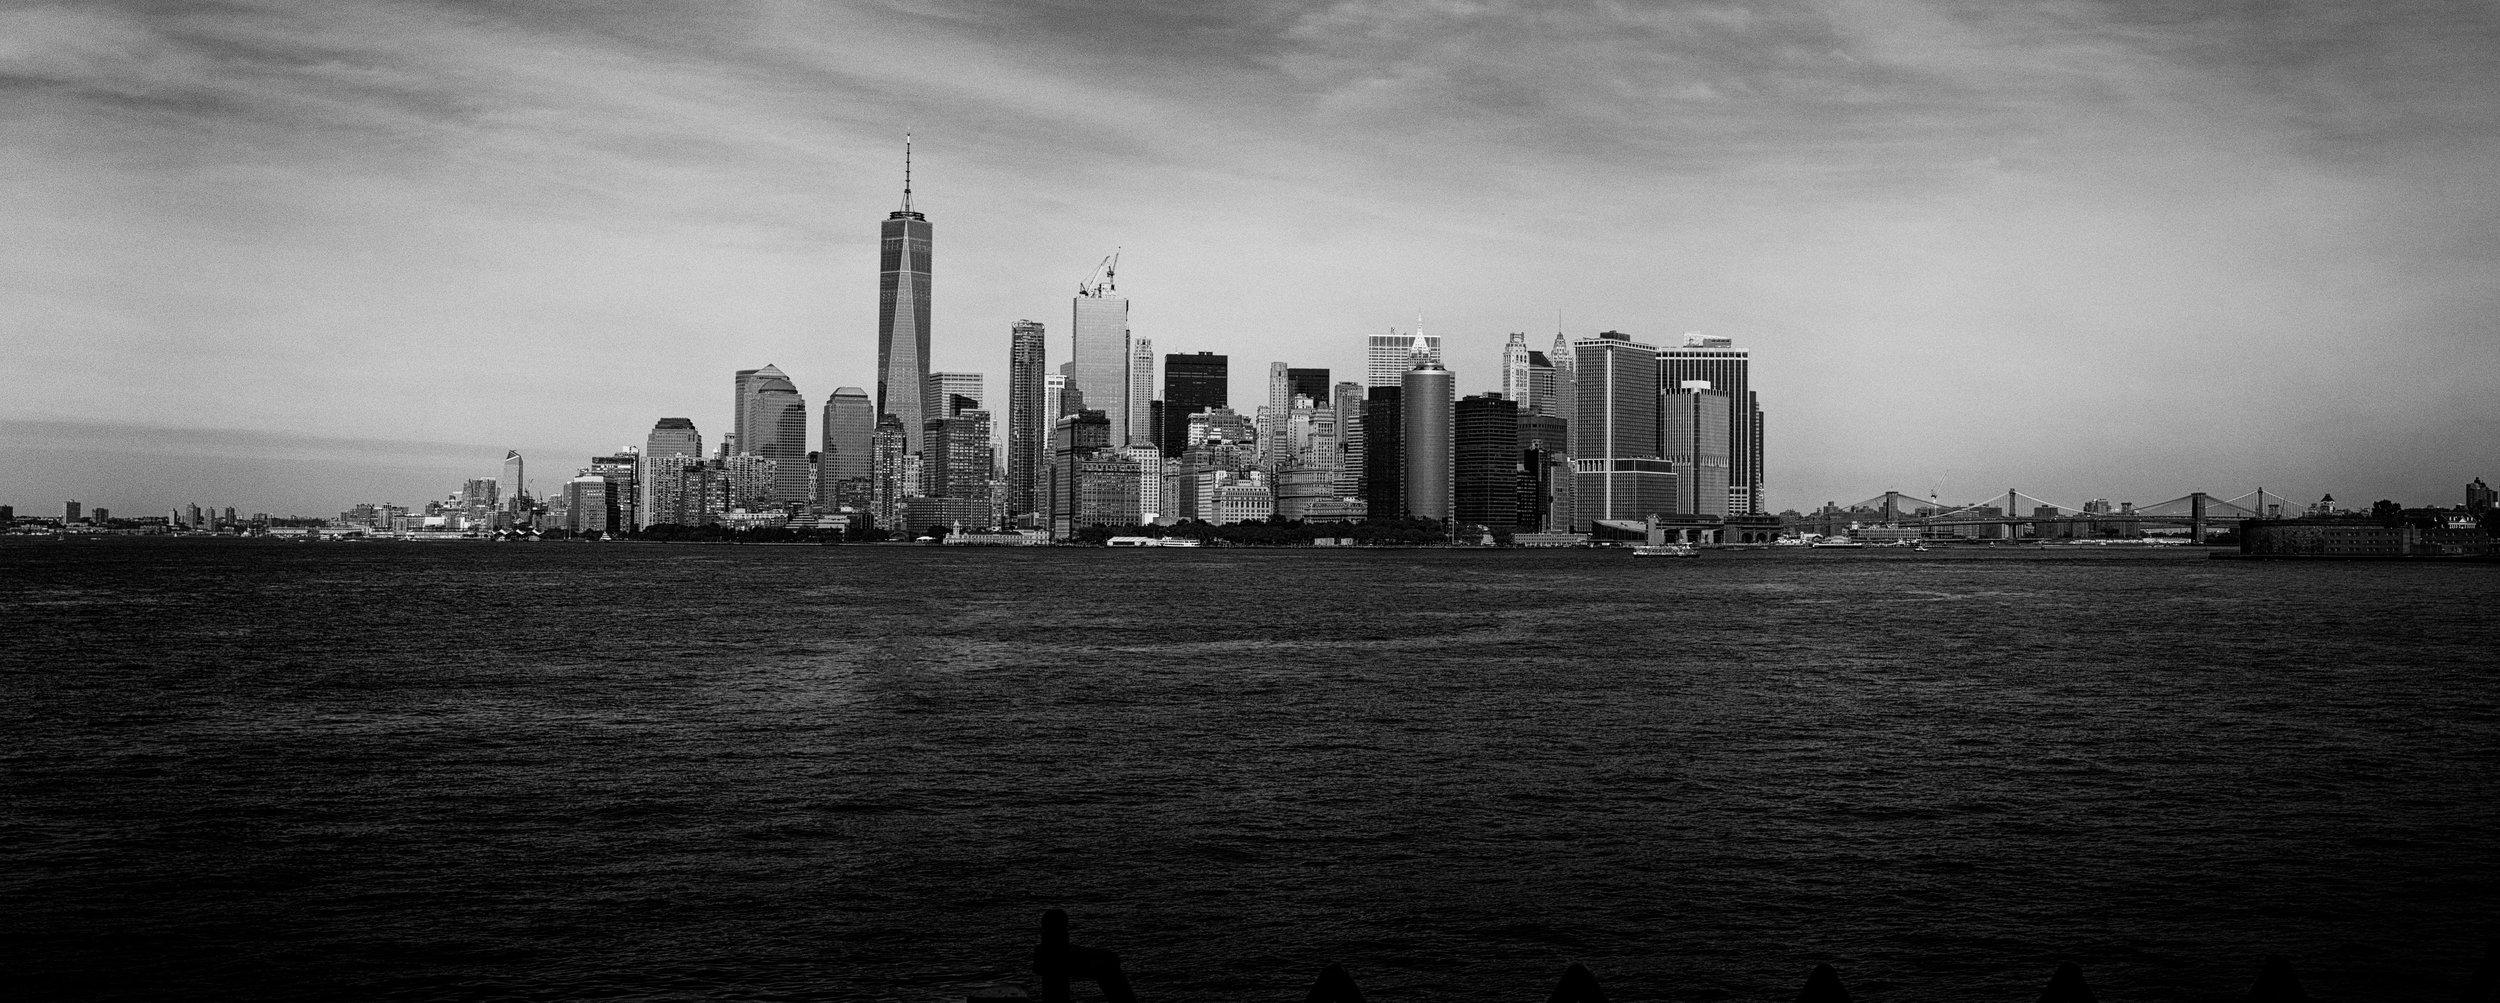 NYC0013.jpg